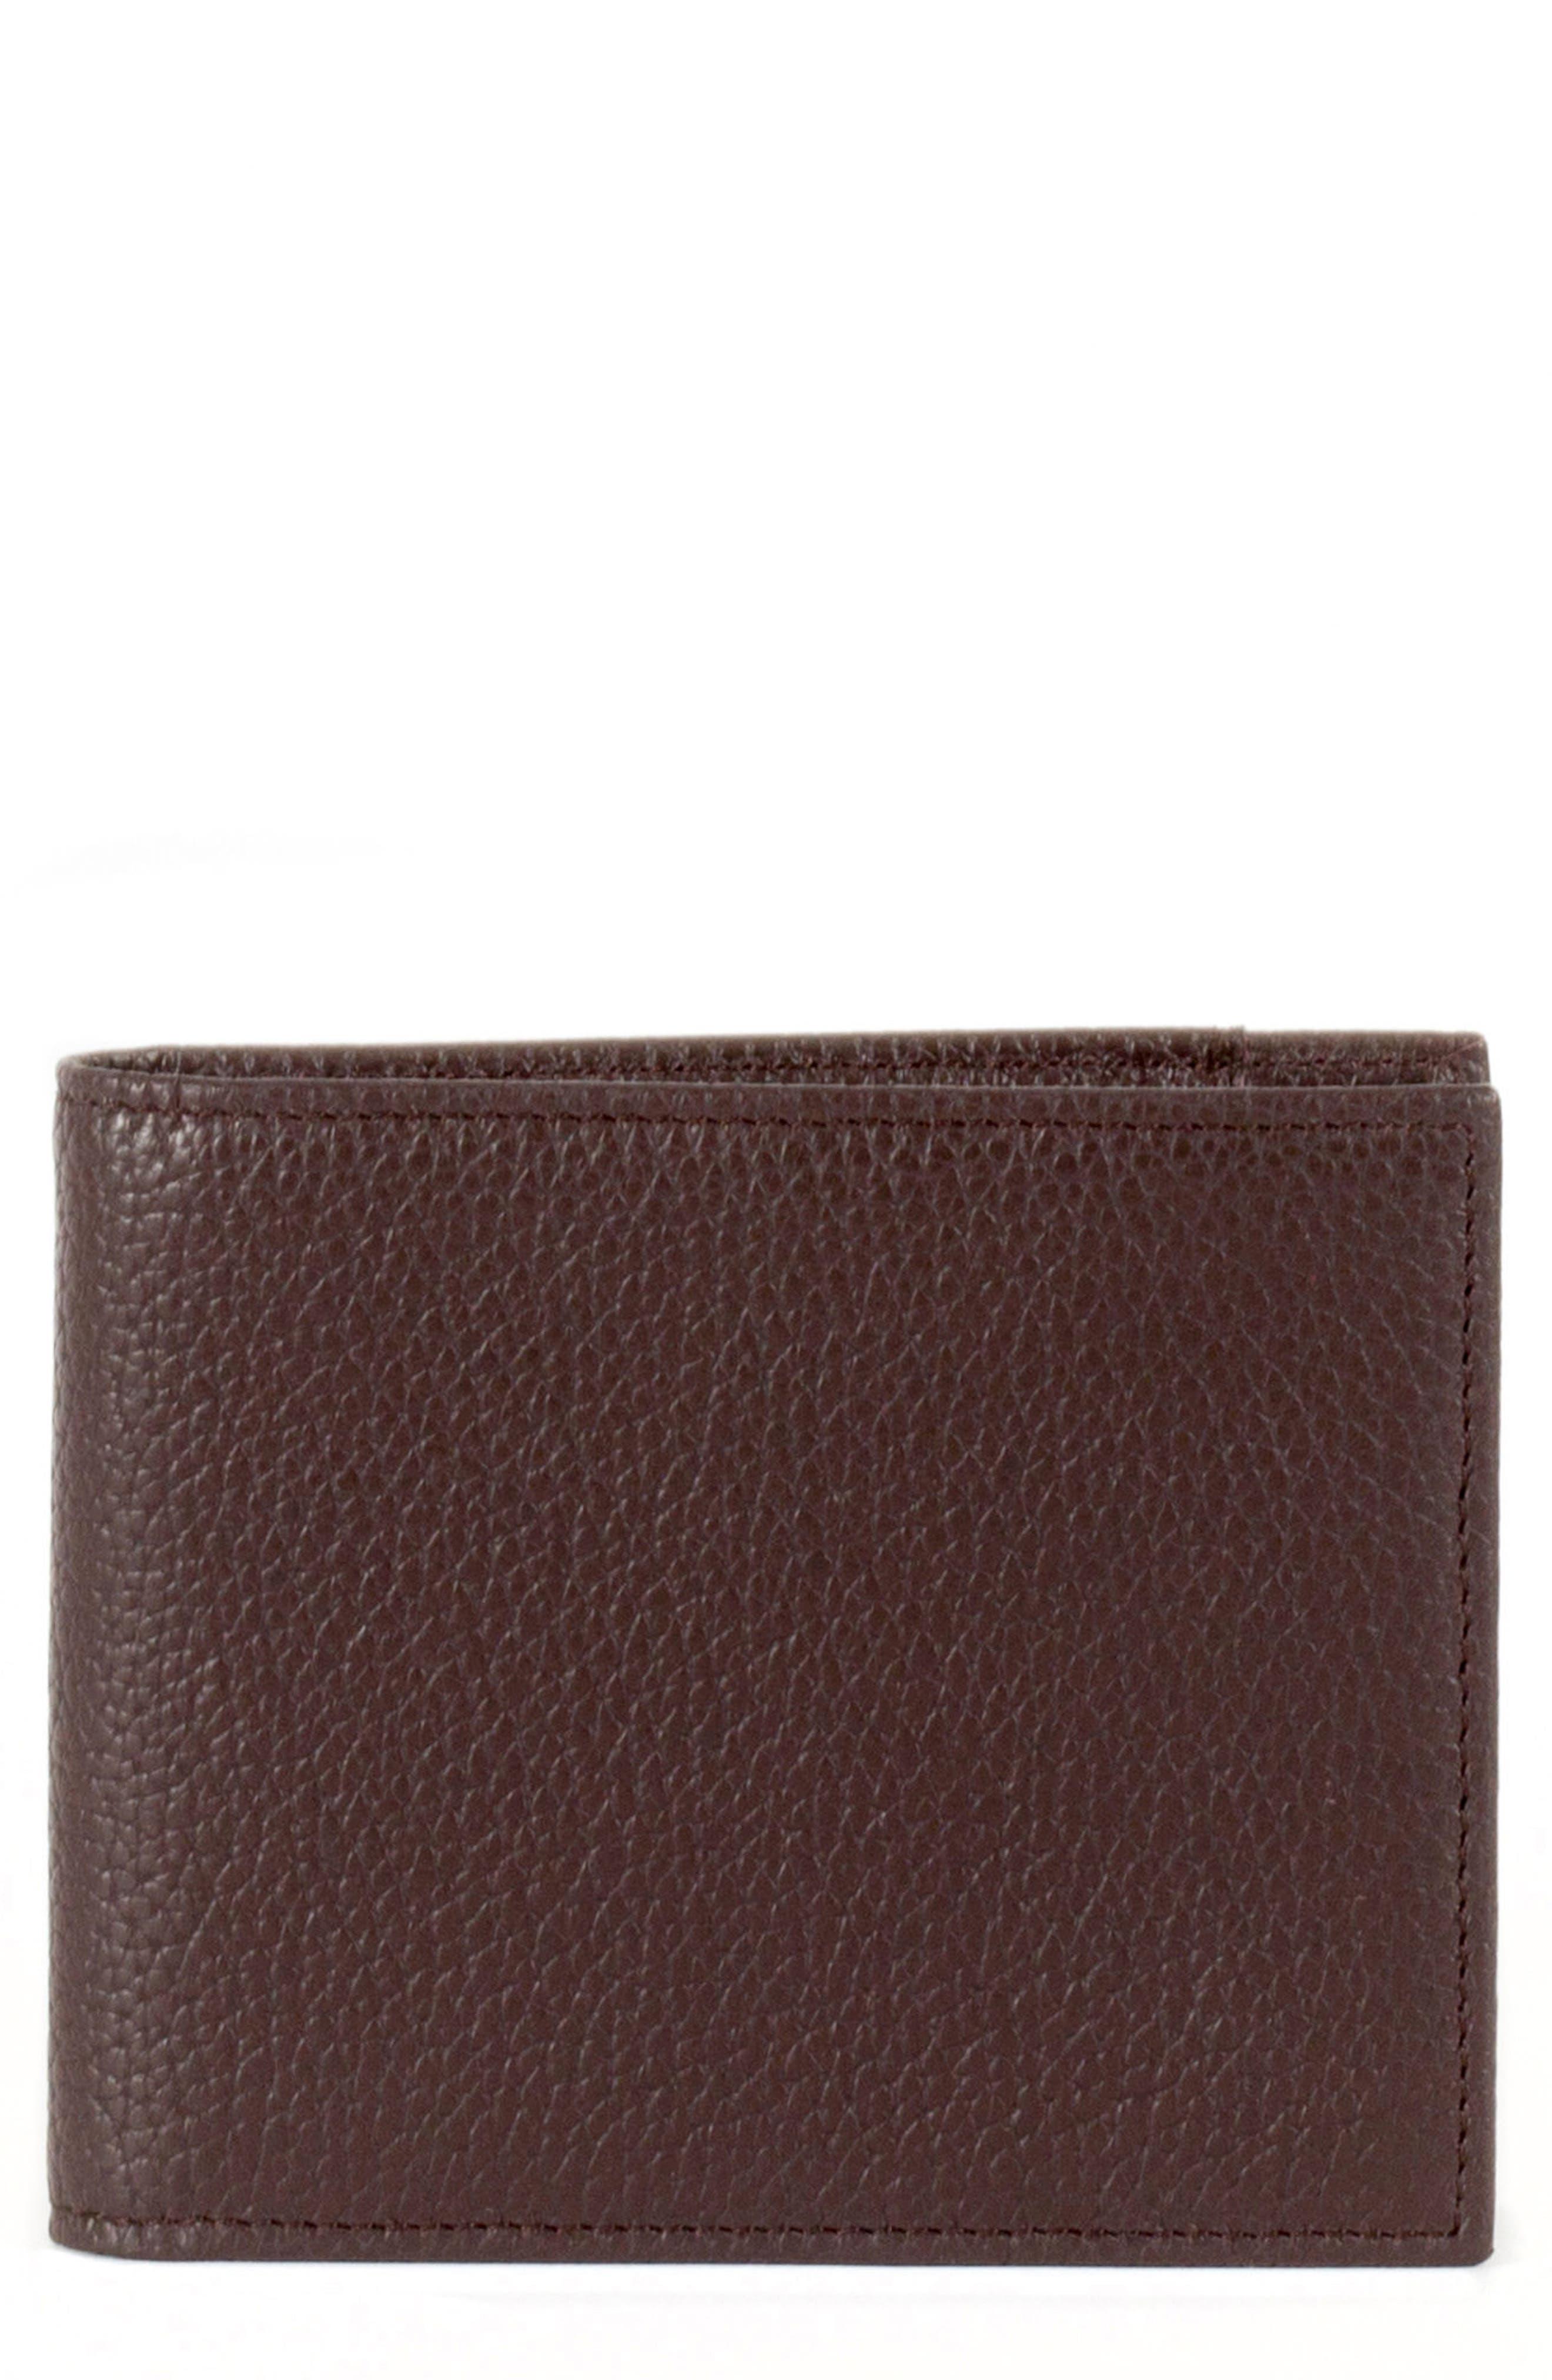 Main Image - Boconi Garth Leather Bifold Wallet